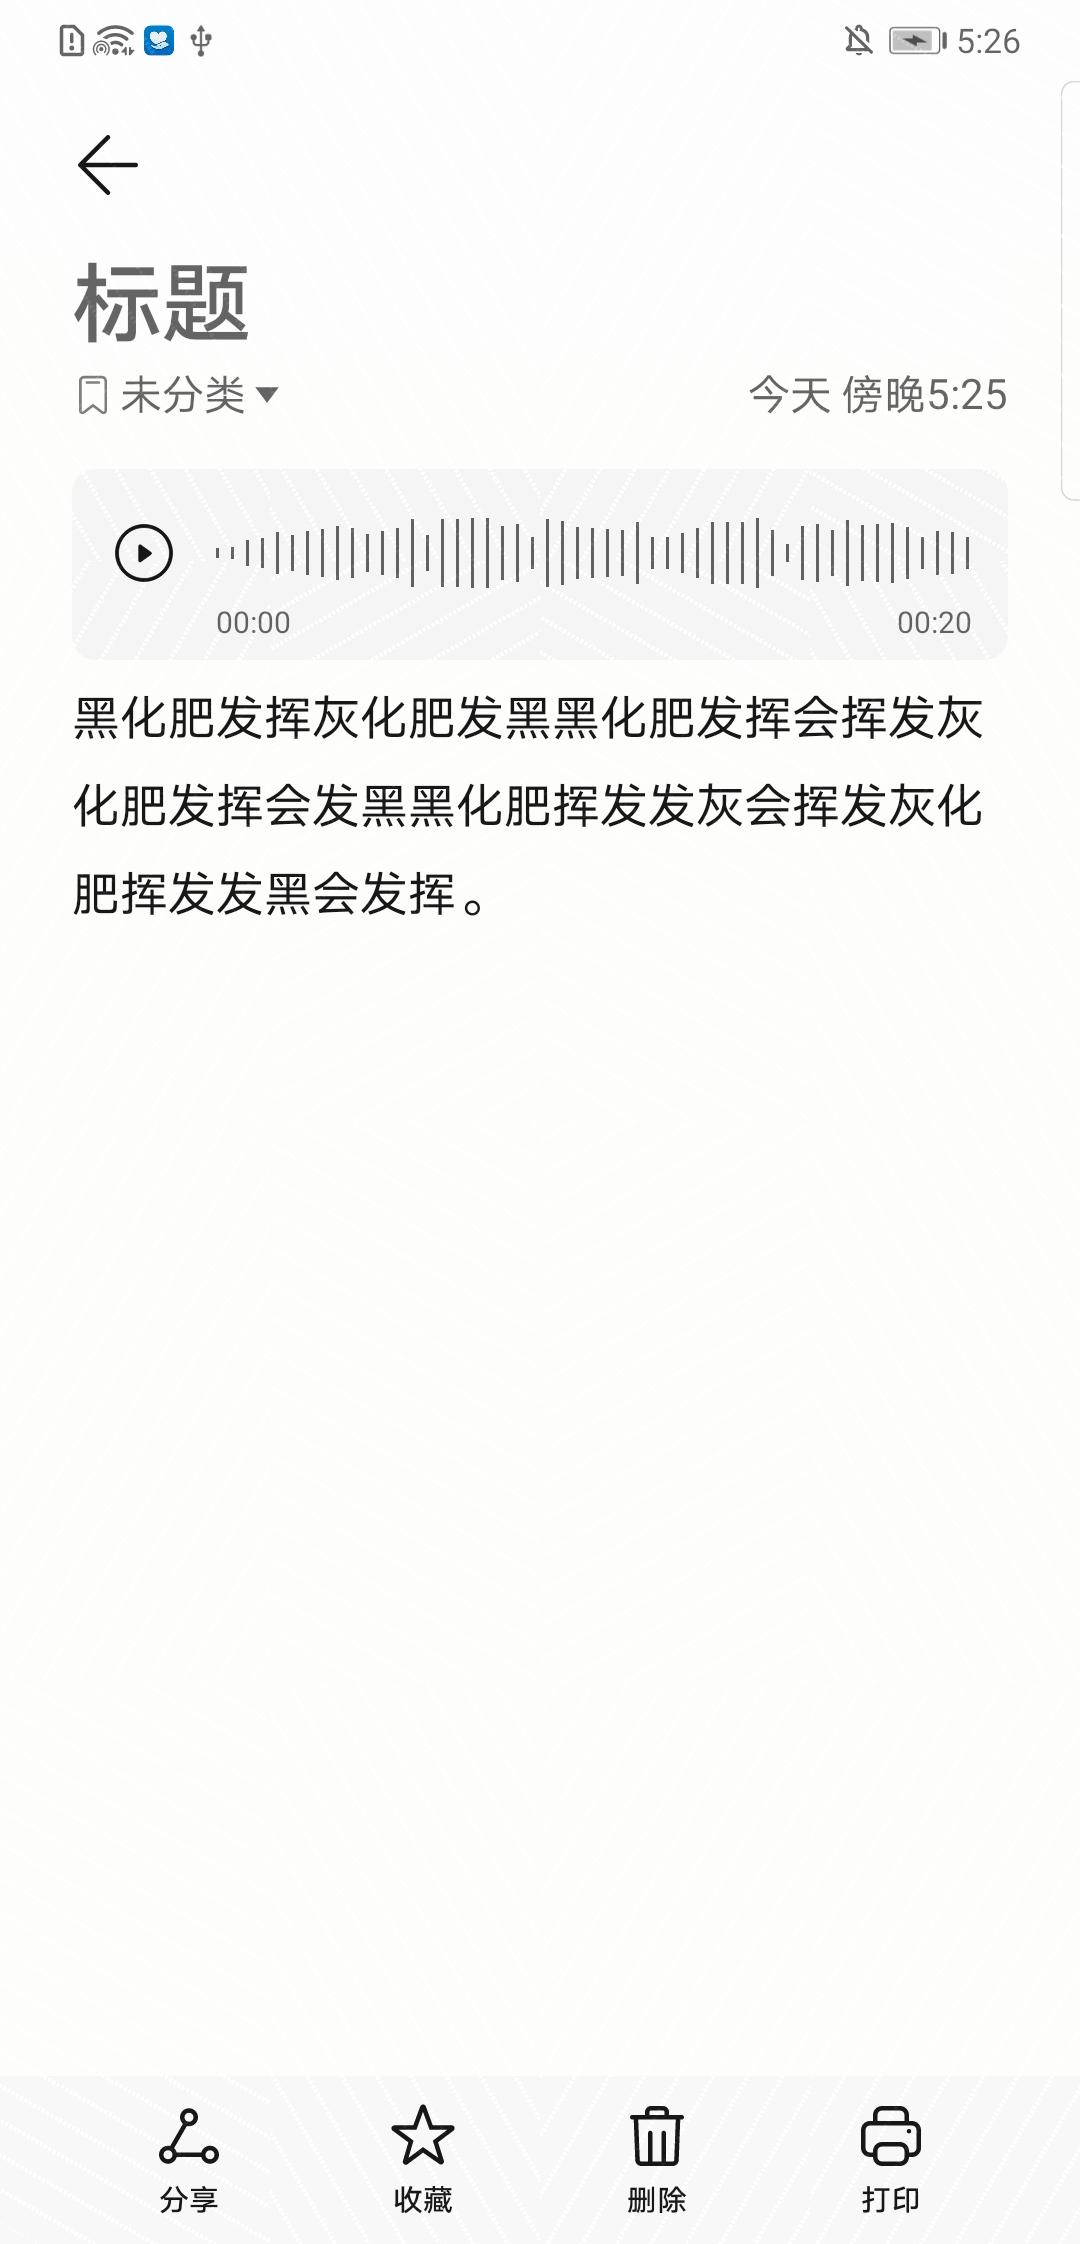 Screenshot_20190820_172618_com.example.android.notepad.jpg